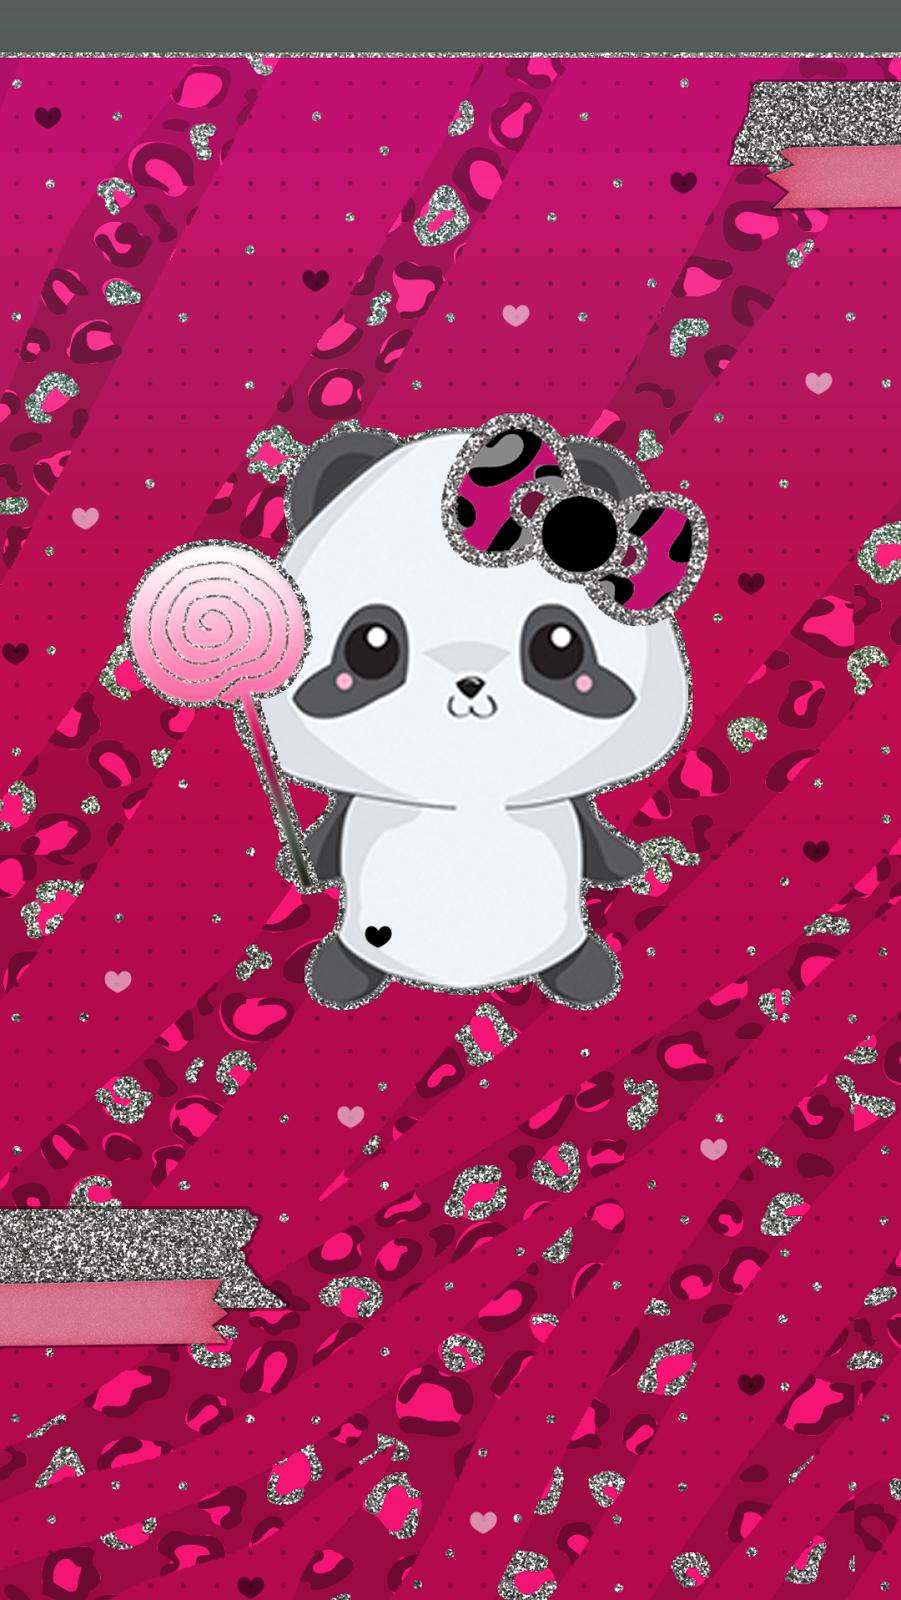 Great Wallpaper Hello Kitty Bear - 75d1105f0a596e49b5ebf222c8f1736d  Pic_93754.png